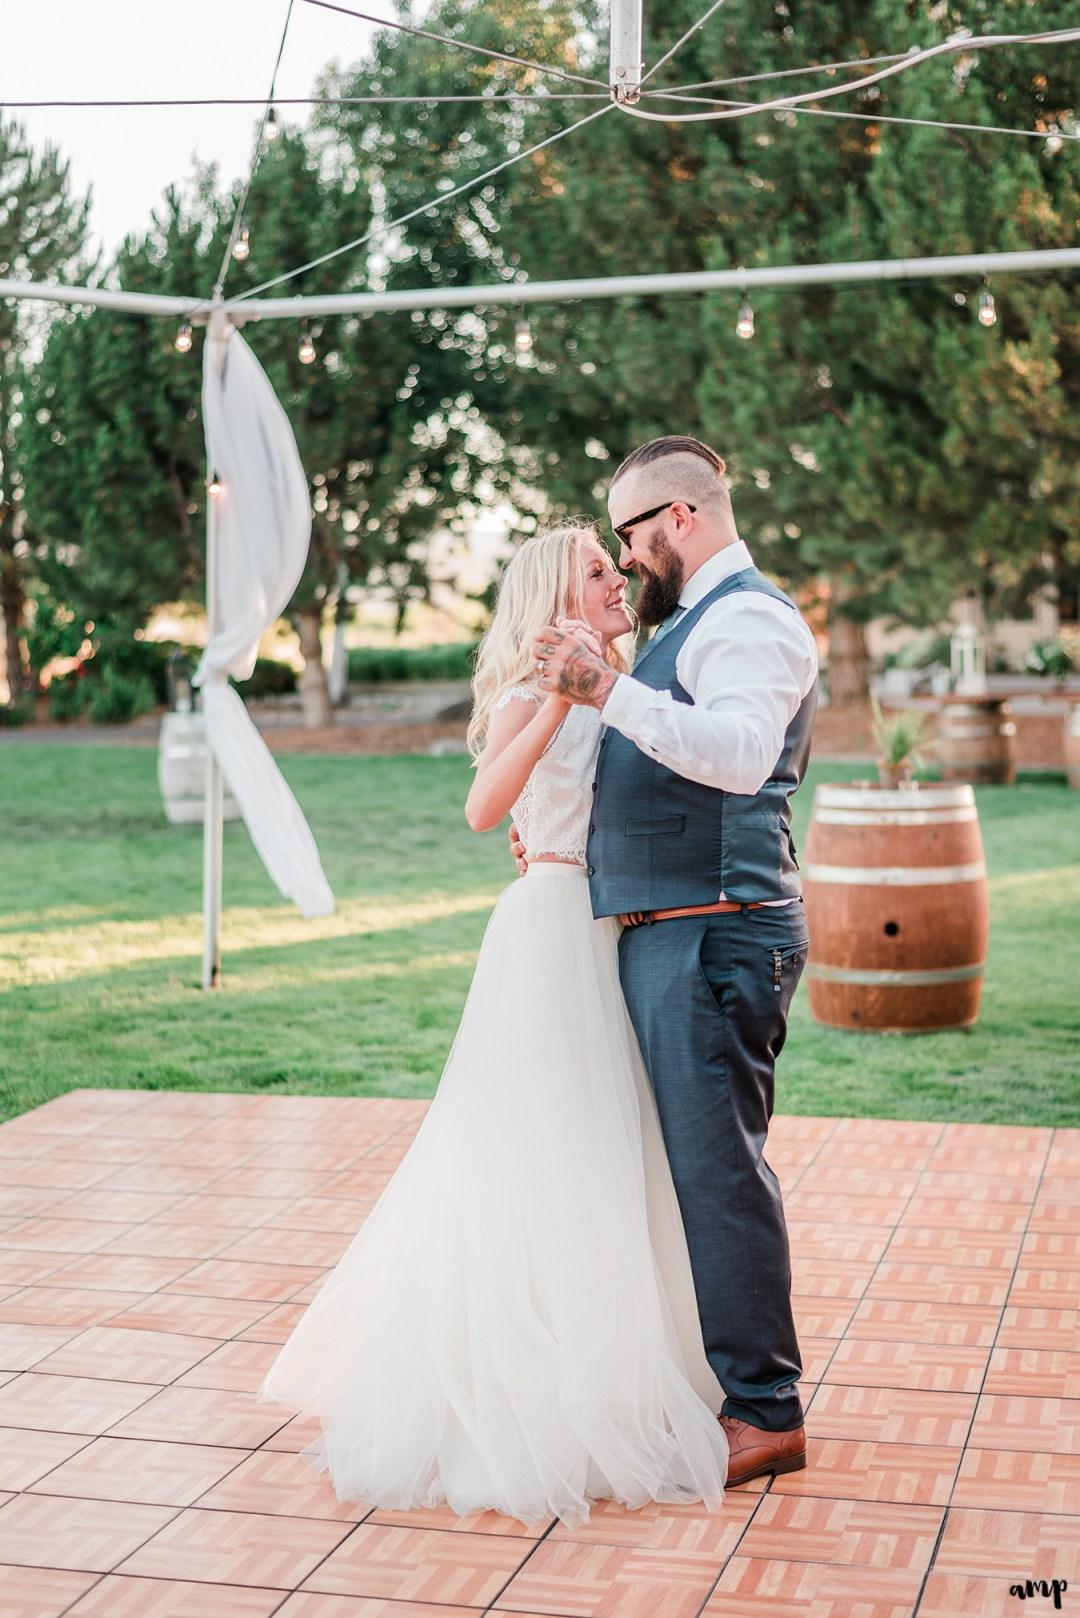 Beth and Dustin's first dance | Grand Junction Backyard Wedding | amanda.matilda.photography